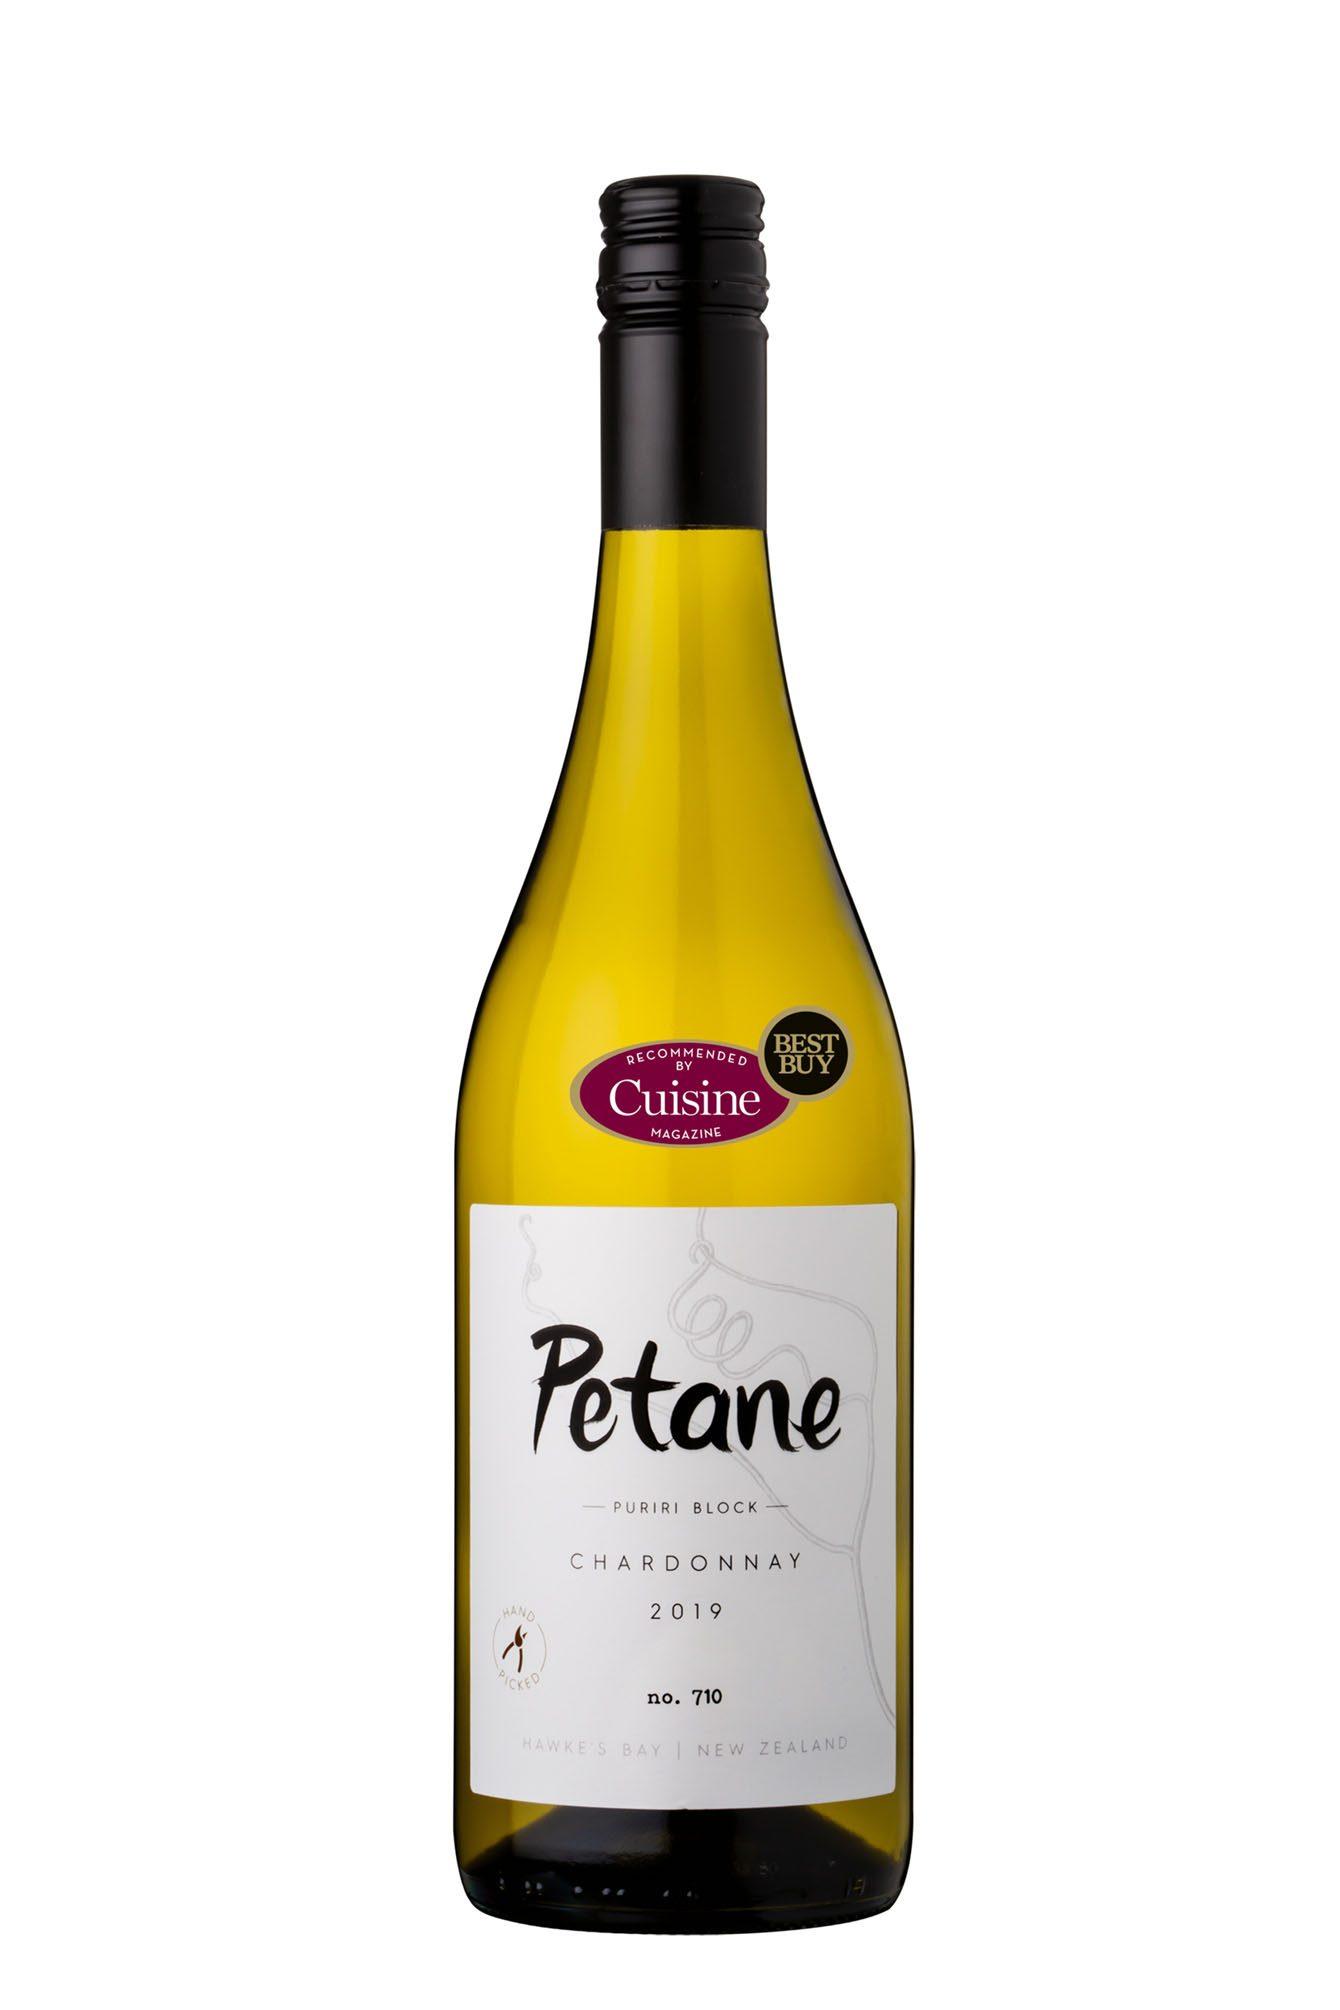 Petane 'Puriri Block' Chardonnay 2019 (Hawke's Bay)